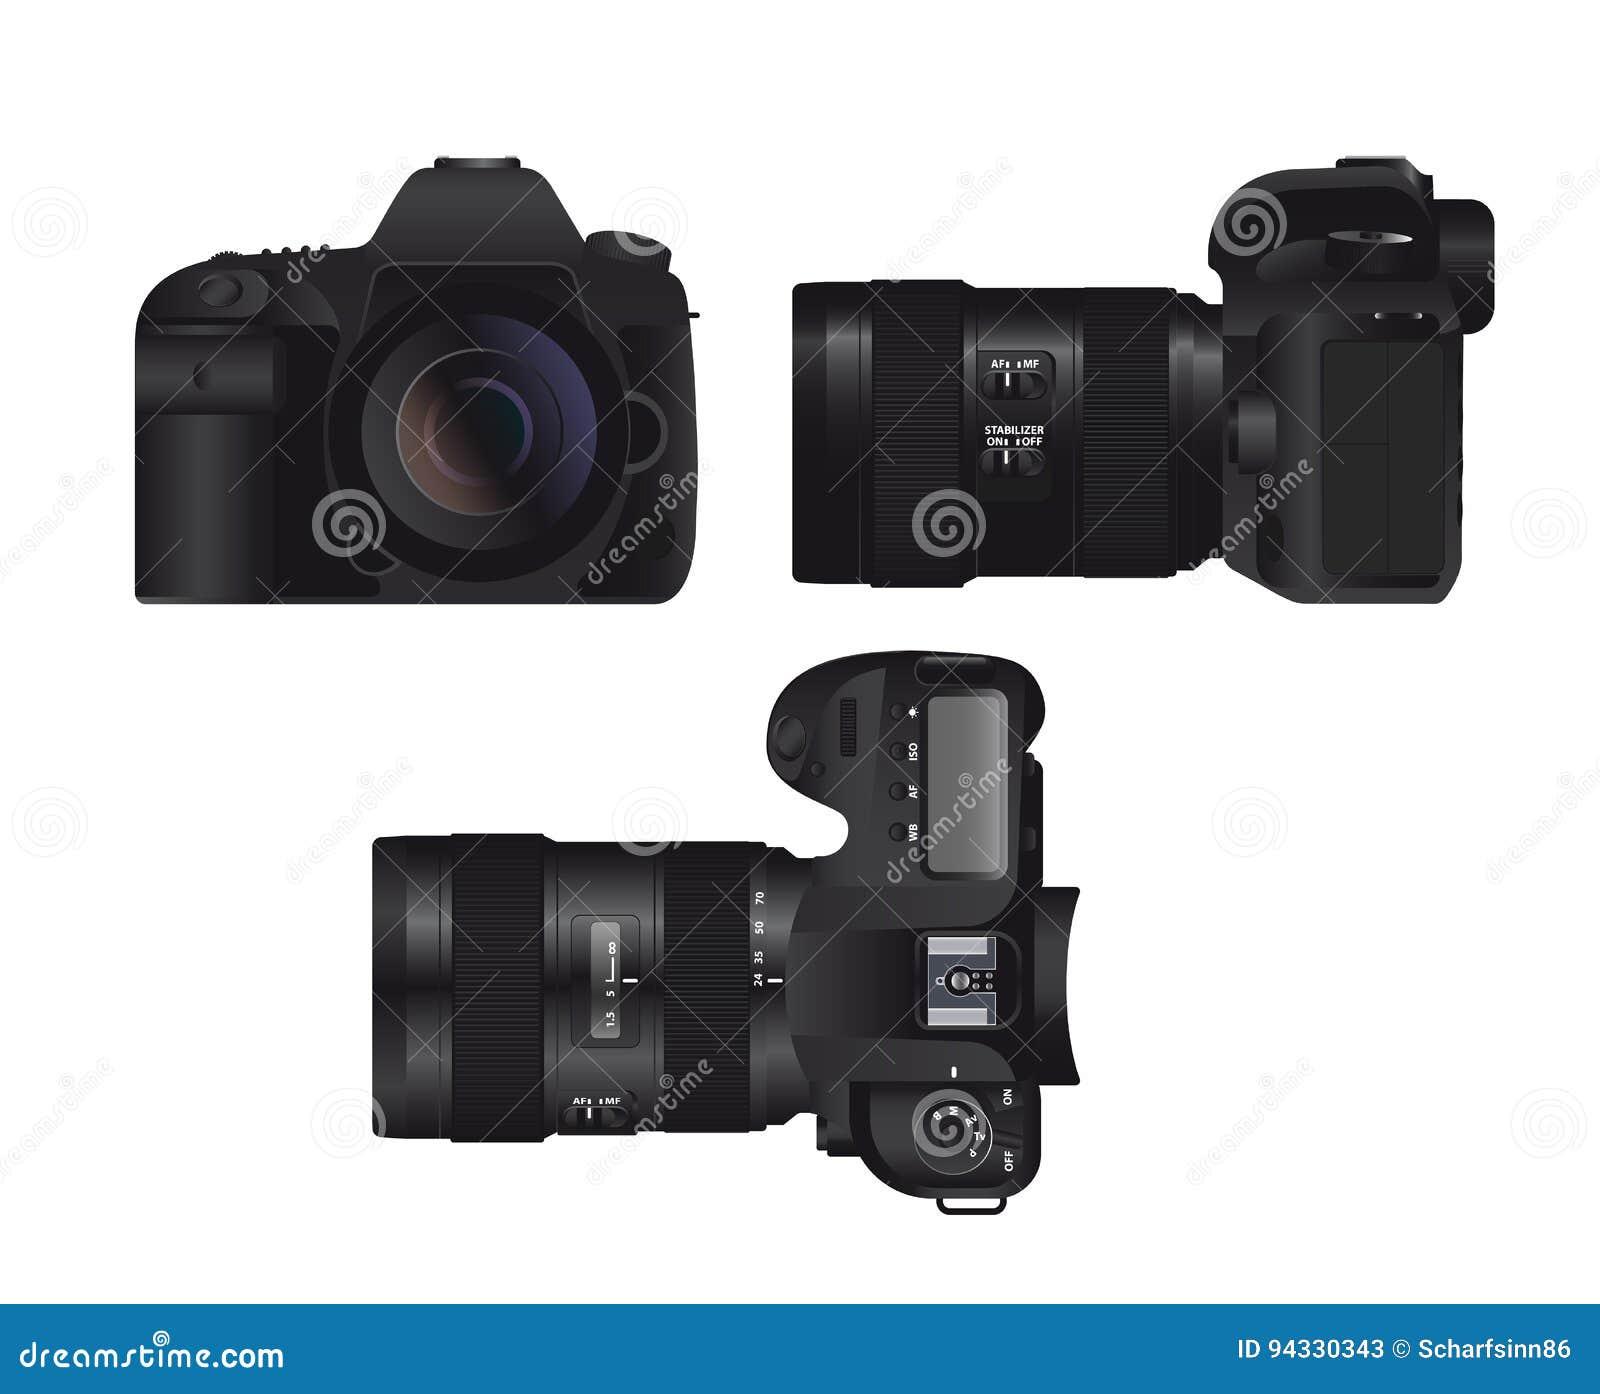 Realistic Full Frame Professional Photo Camera DSLR Stock Vector ...